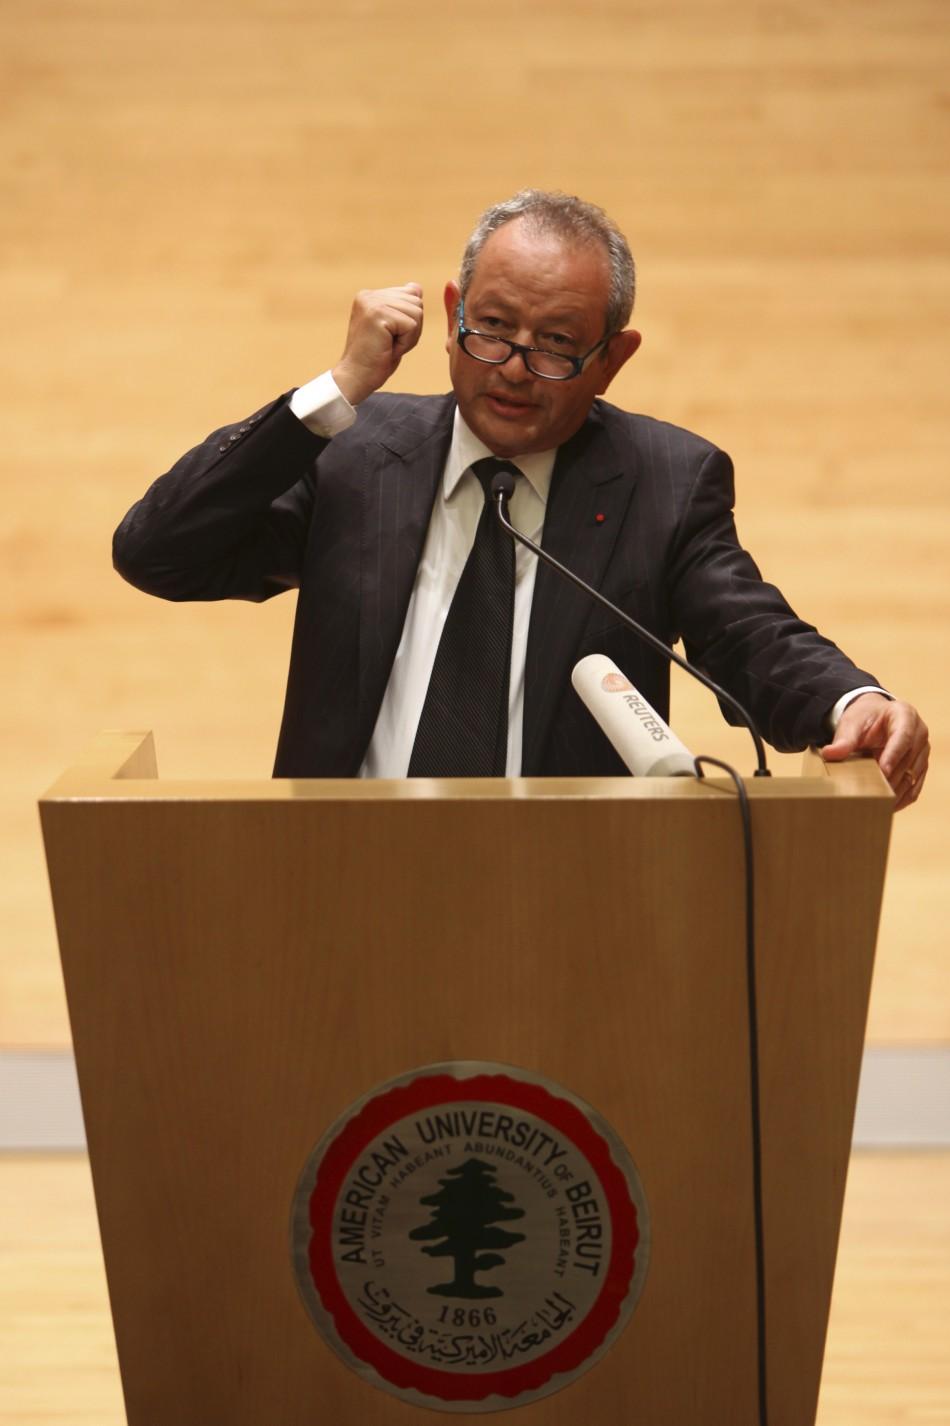 Orascom Telecom chairman Naguib Sawiris